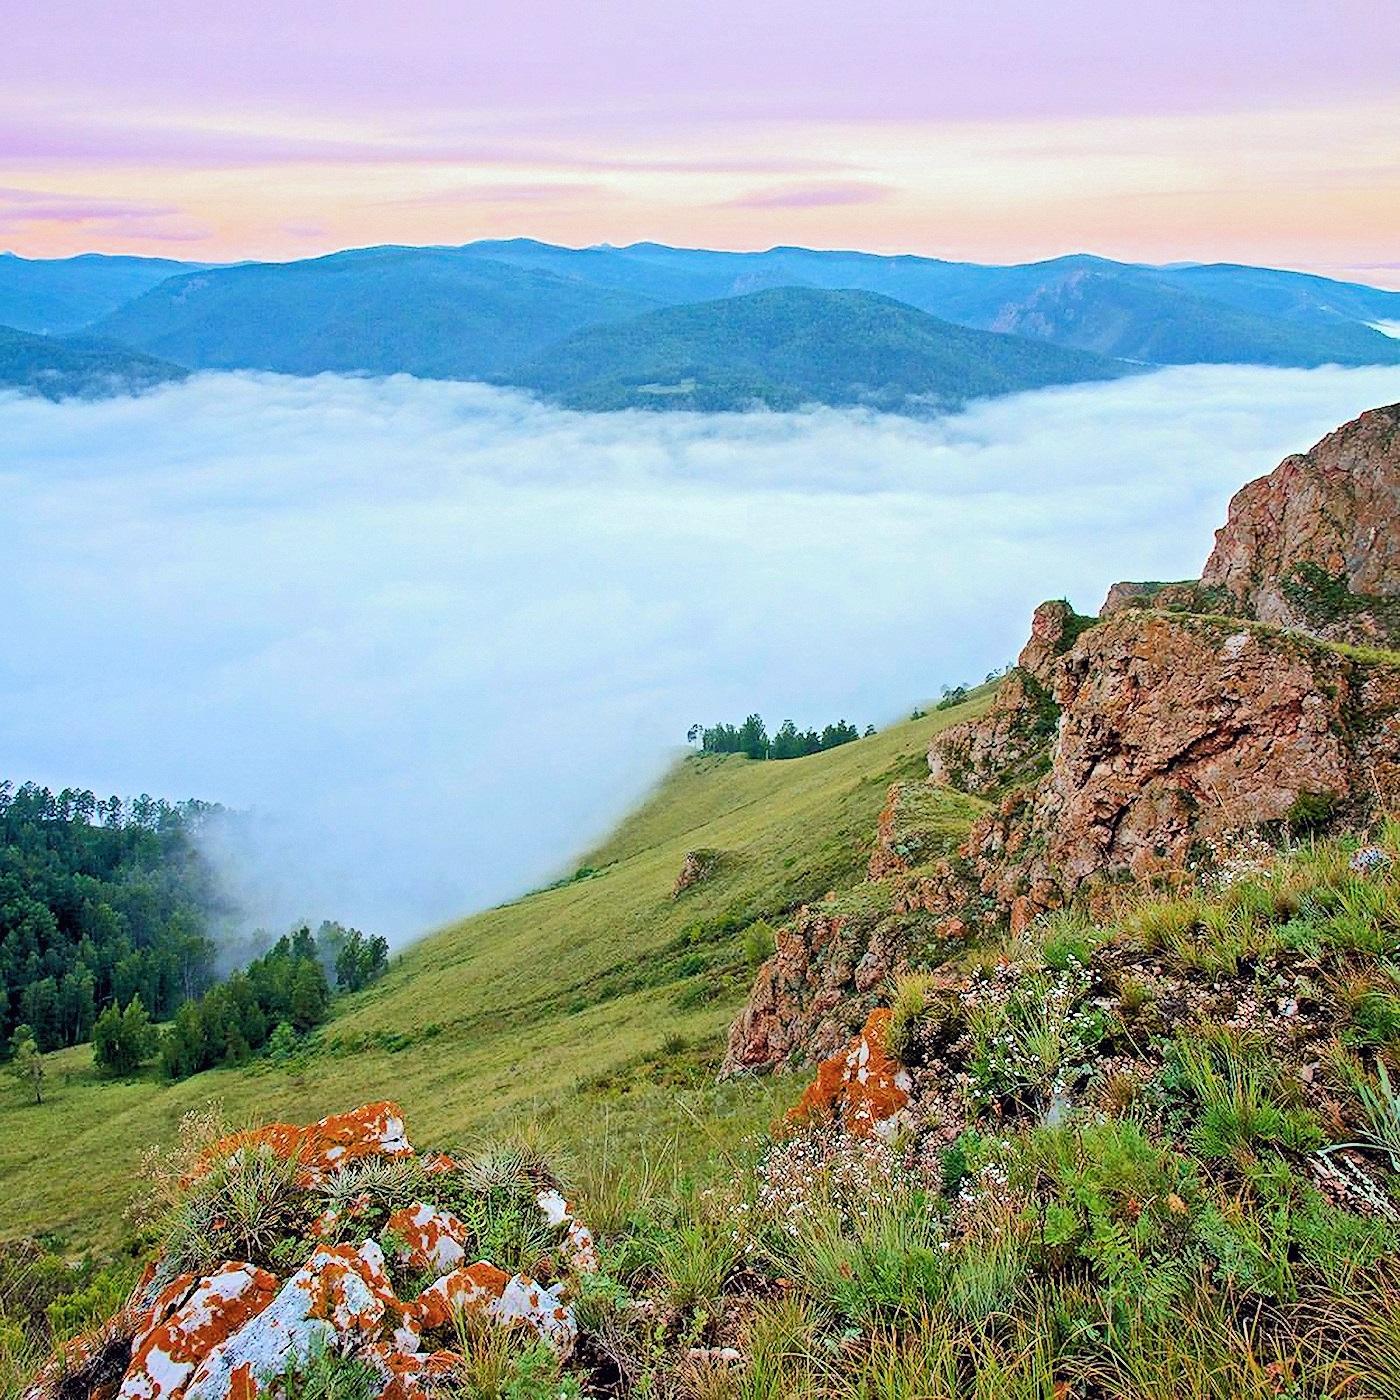 00-mark-bazuev-sunrise-on-torgashinsky-ridge-krasnoyarsk-krai-2016